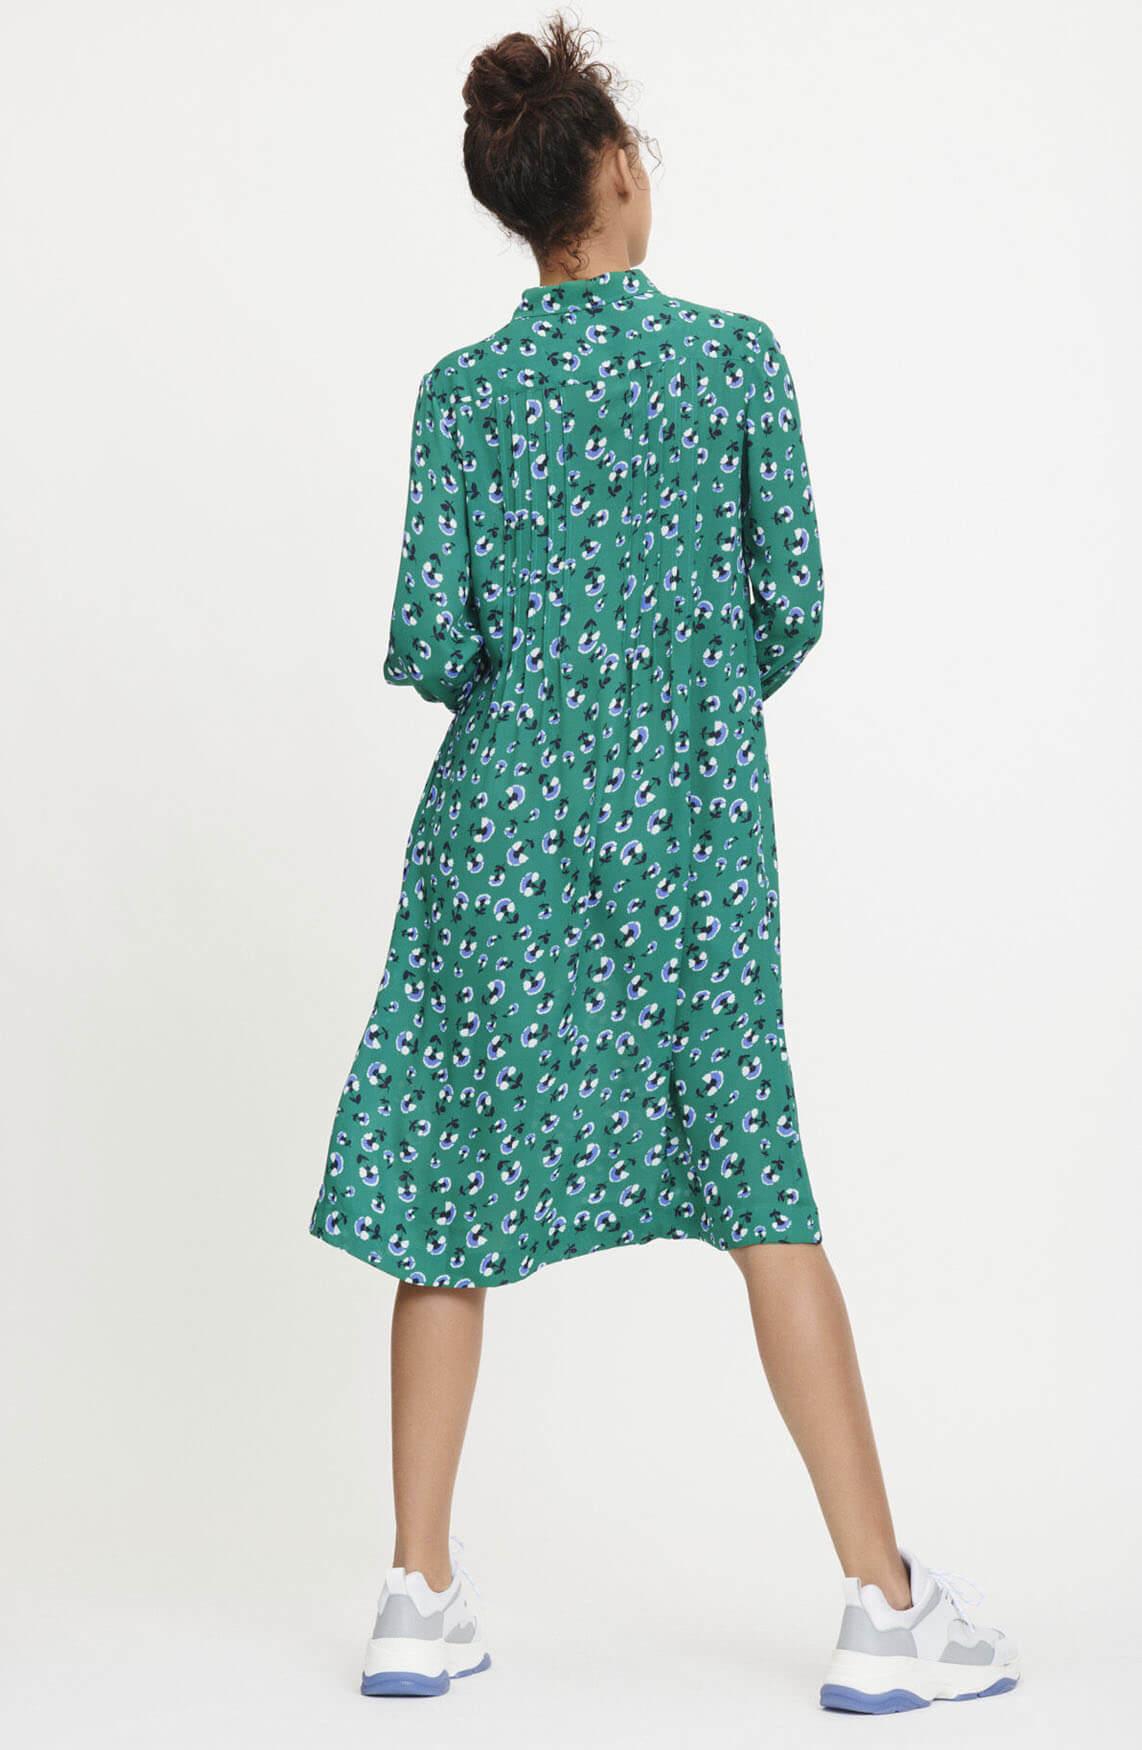 Samsoe Samsoe Dames Musa jurk groen